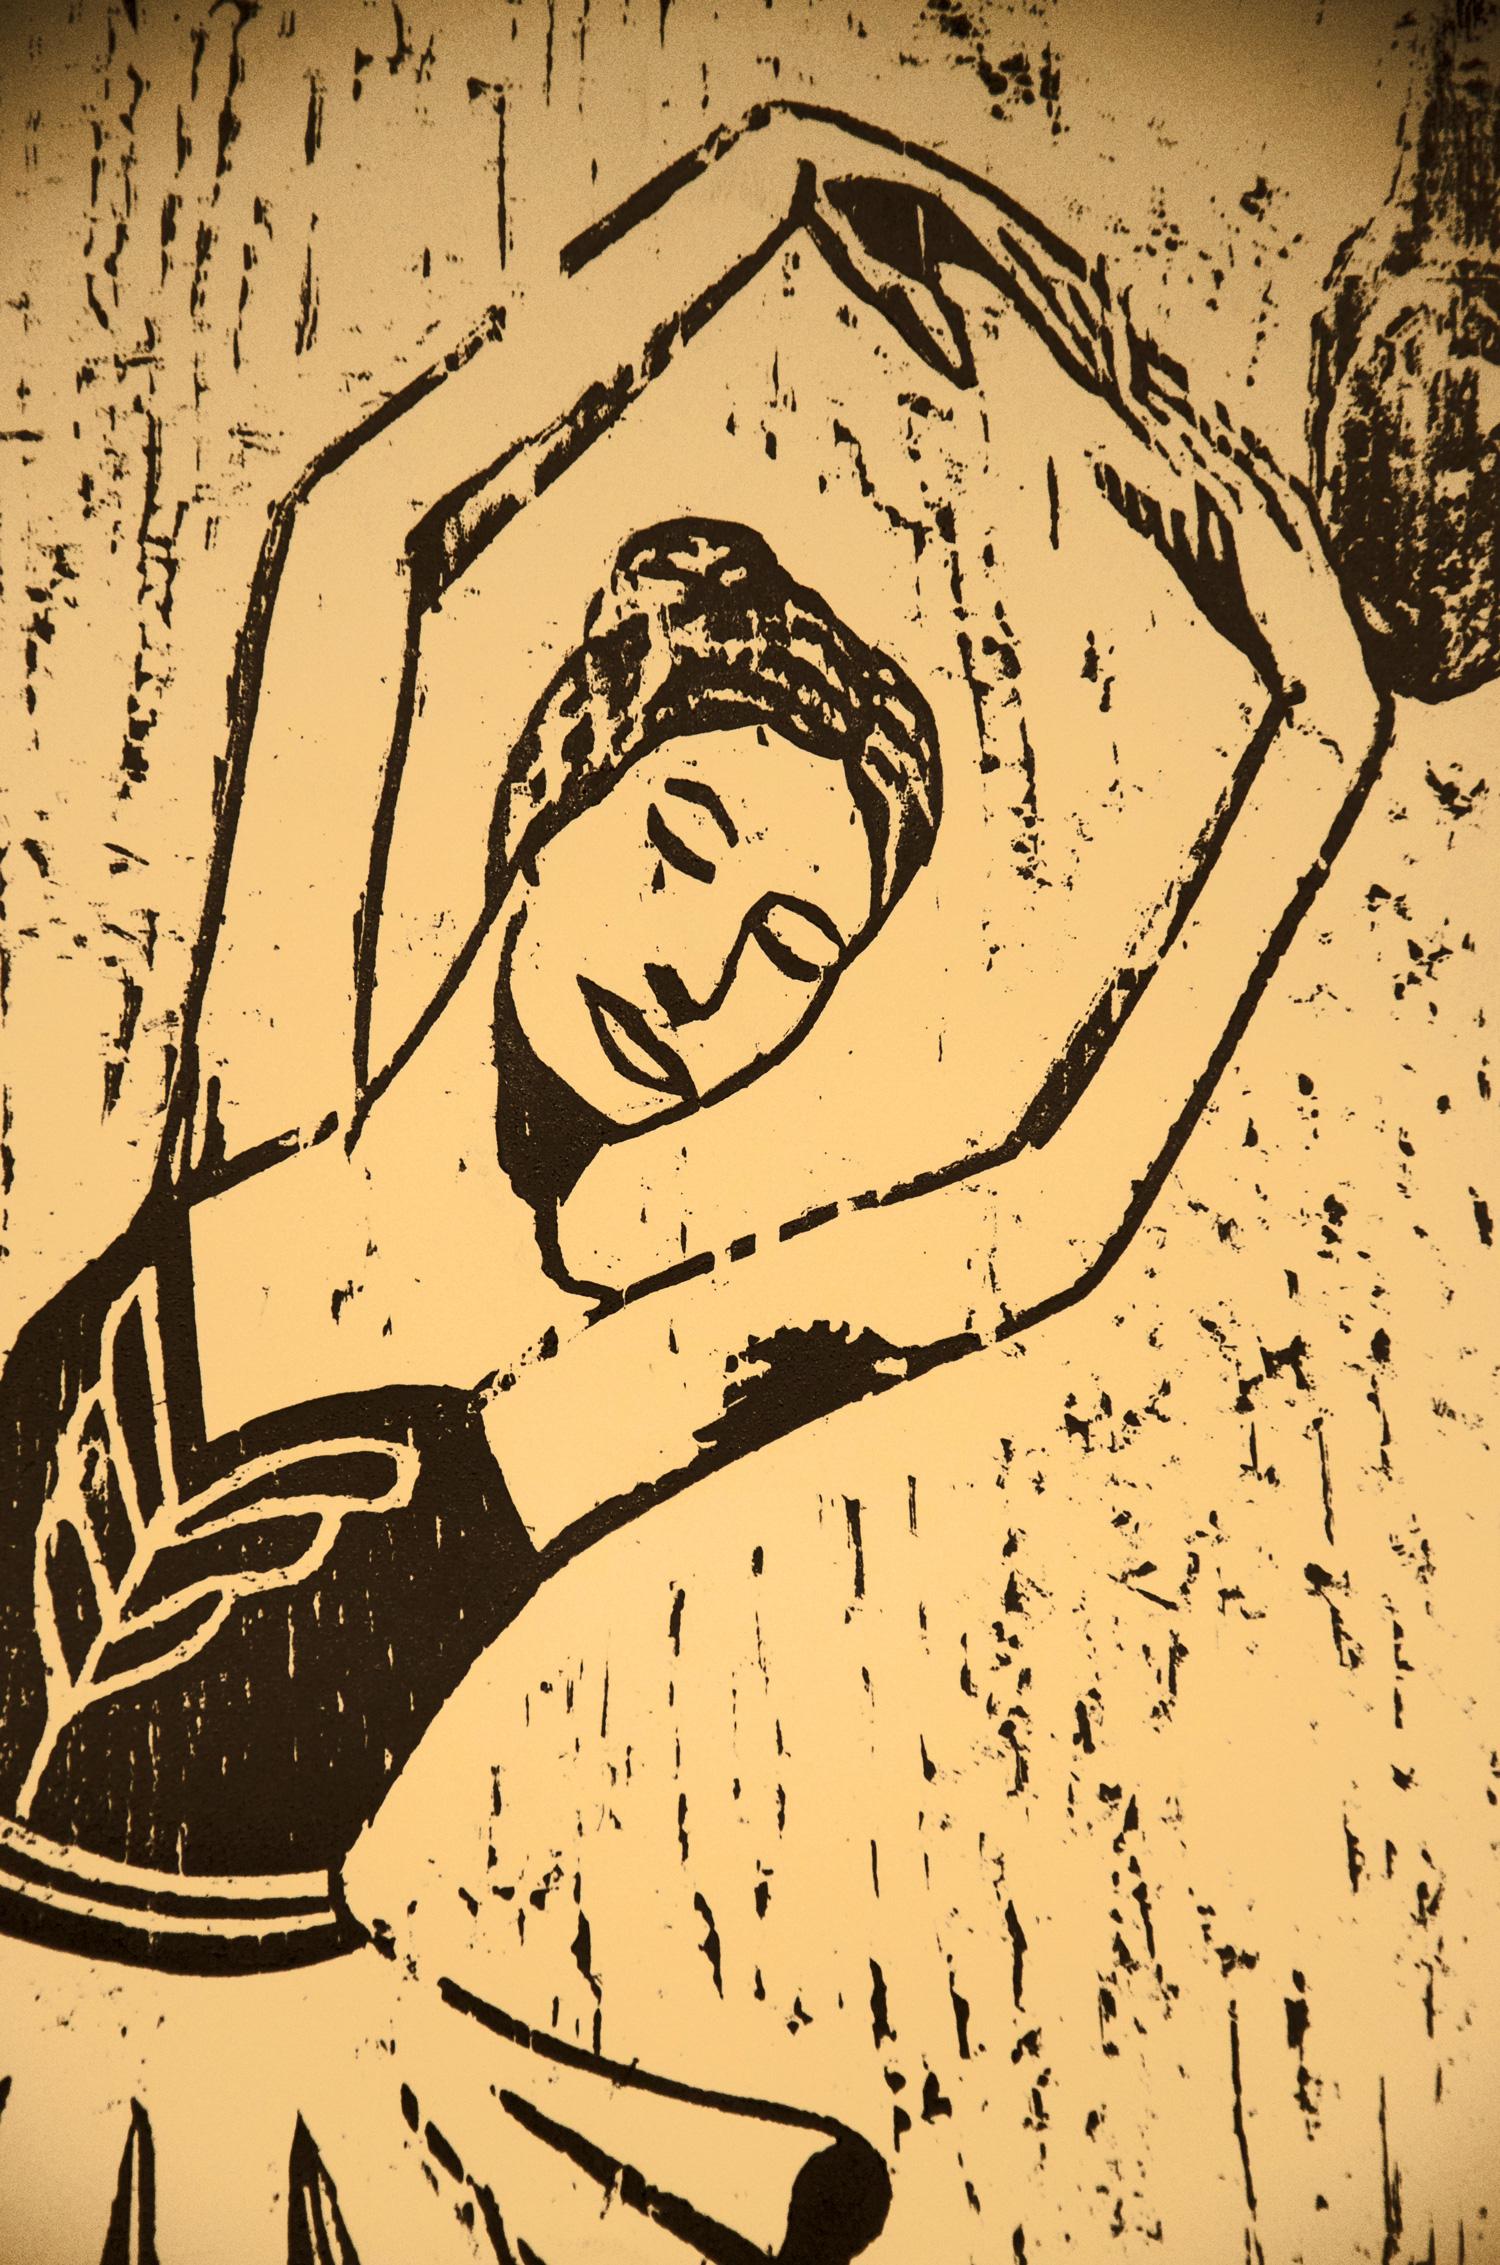 Ballerina, woodcut print, by Tara Marolf